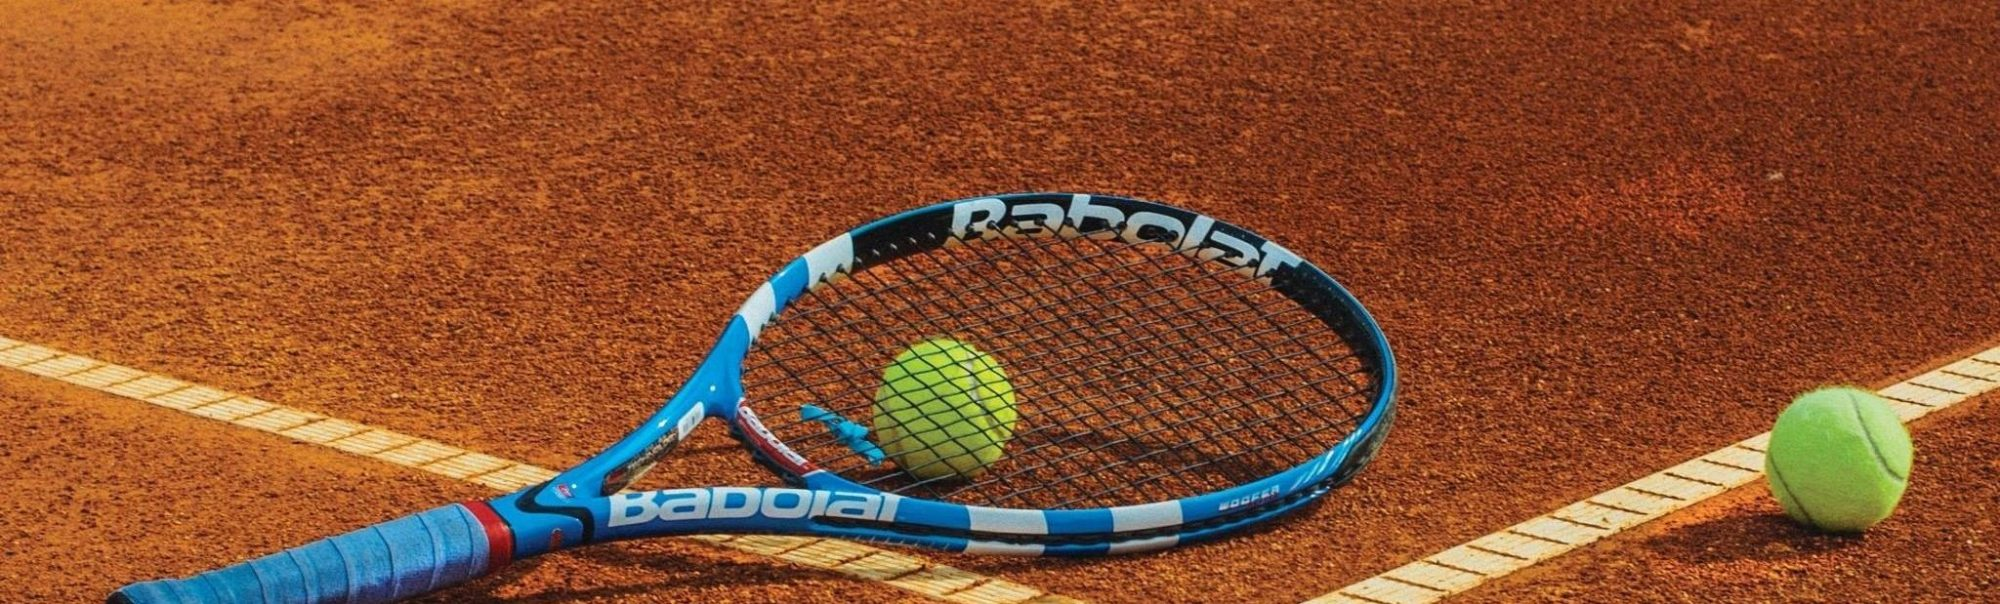 Teniški klub Murska Sobota